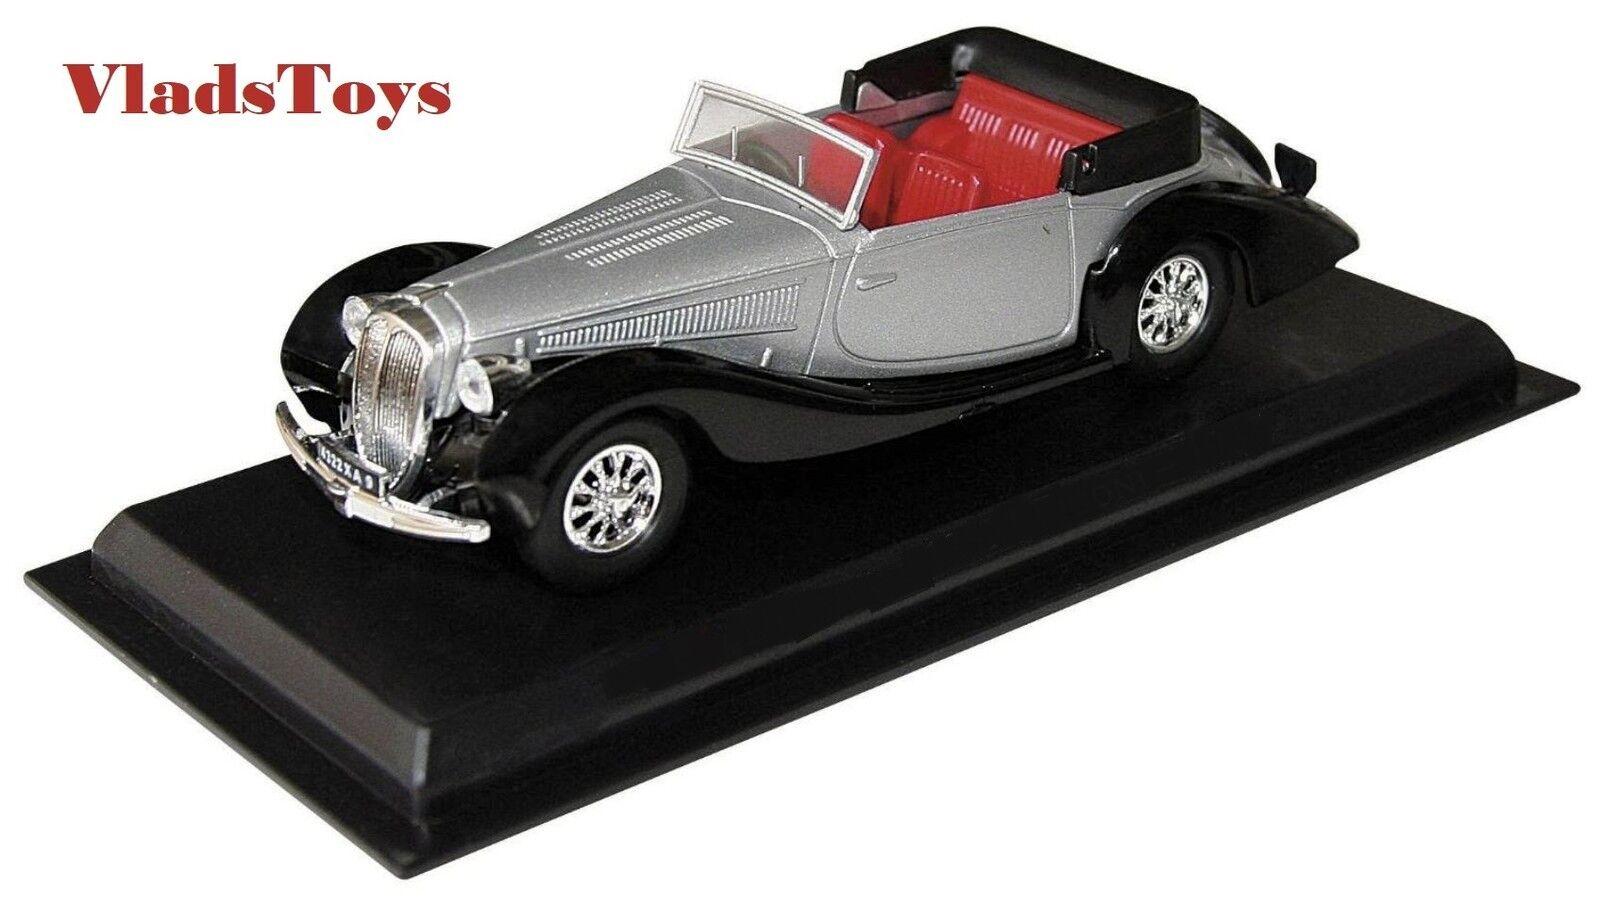 Amercom 1 43 Escala Legendario Cars Delahaye 135M Figoni Figoni Figoni - 1937 ACSD12 EEUU  caliente